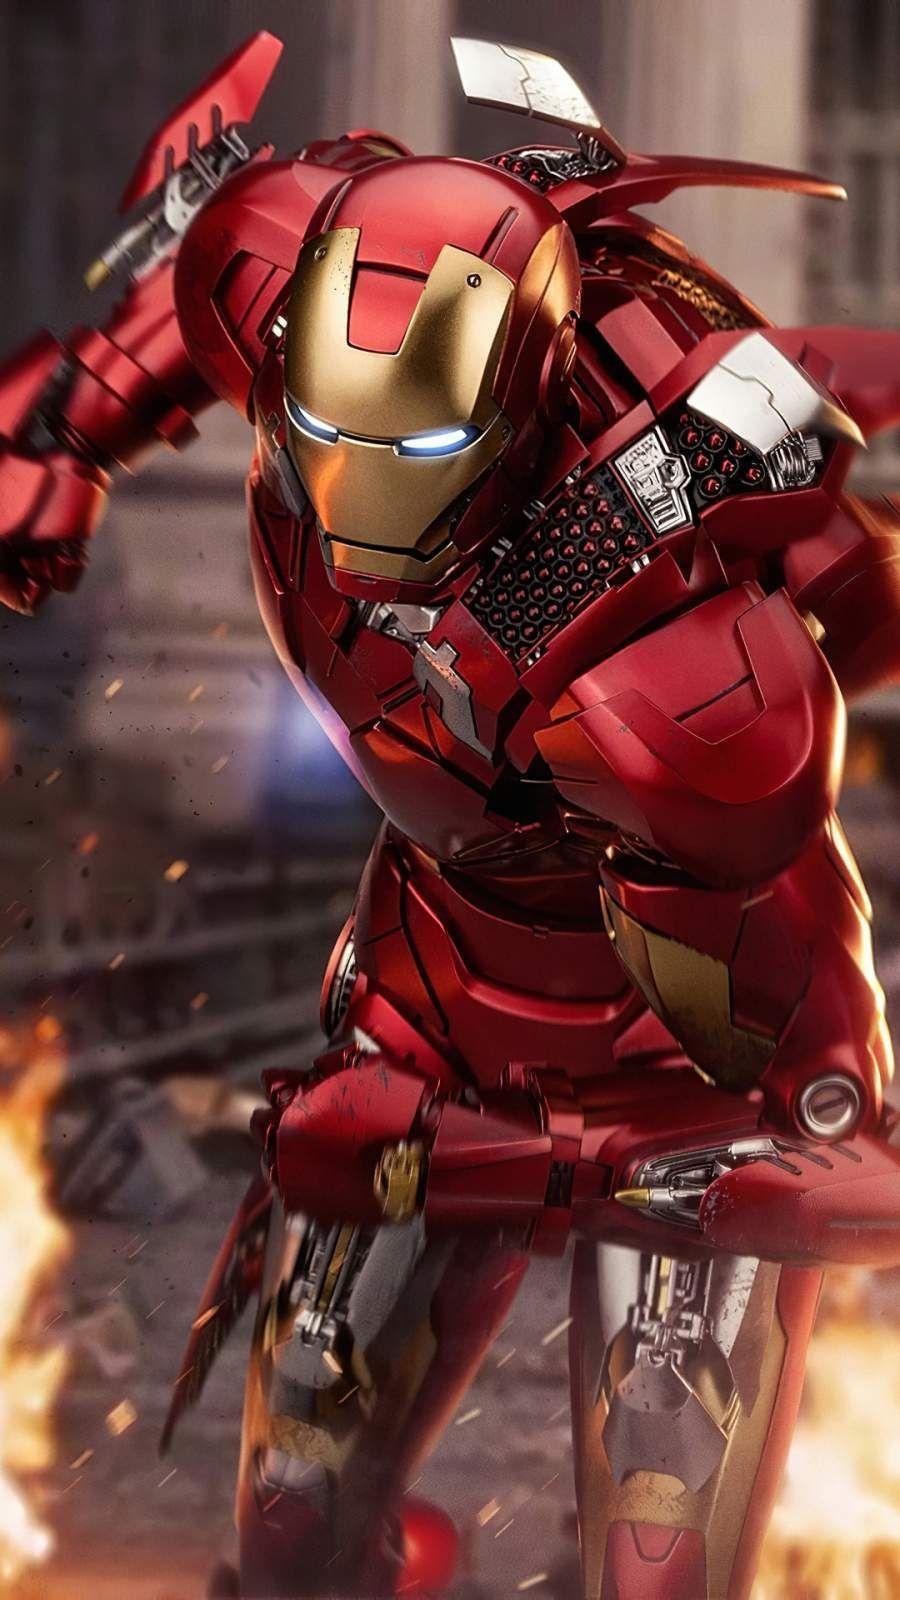 Iron Man 3 Wallpaper Iron Man Iron Man Wallpaper Man Wallpaper Iron Man Comic